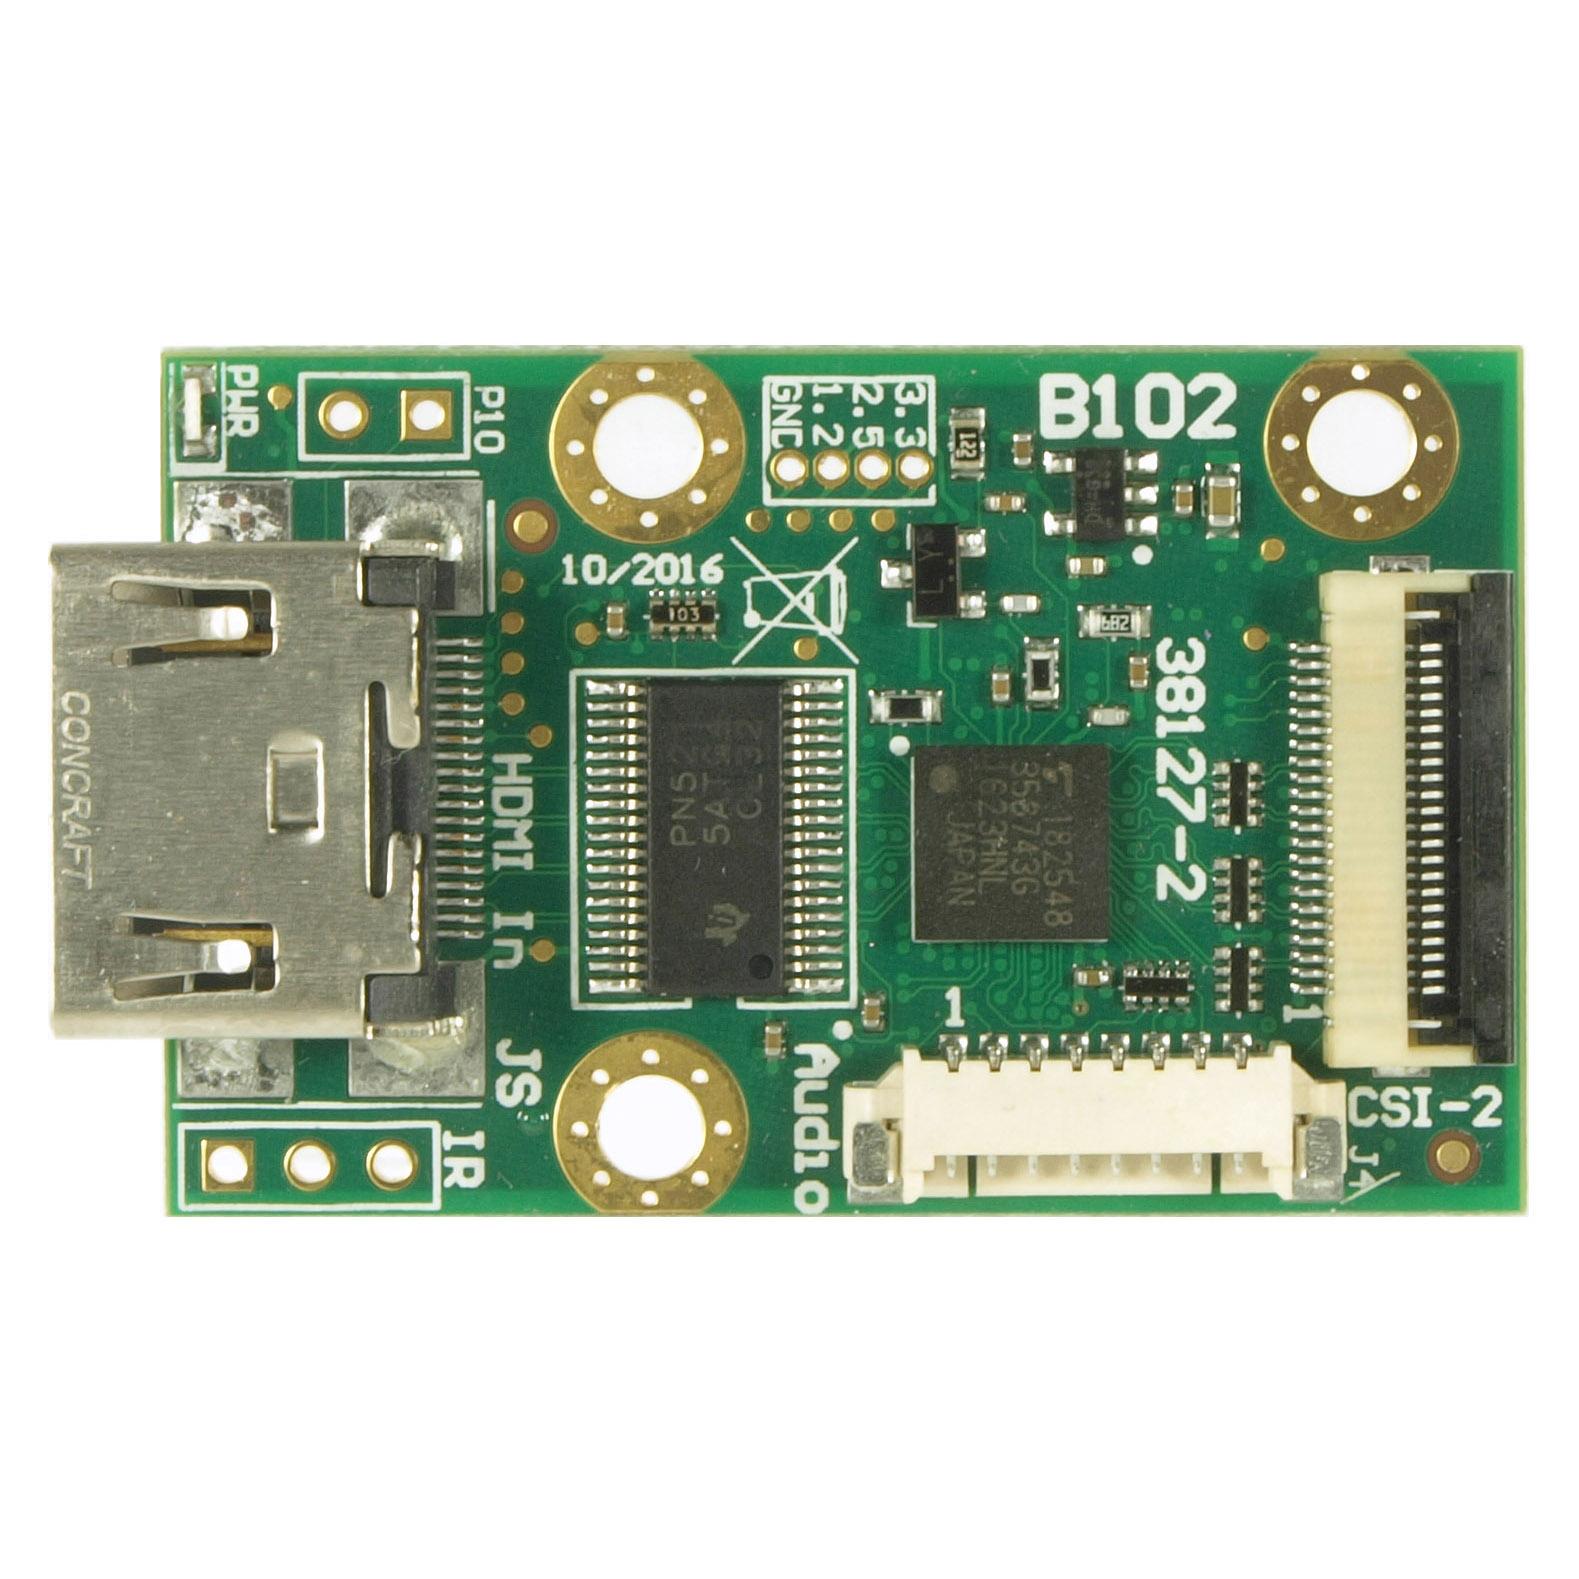 B102 HDMI to CSI-2 bridge (rev 2 with I2S audio)